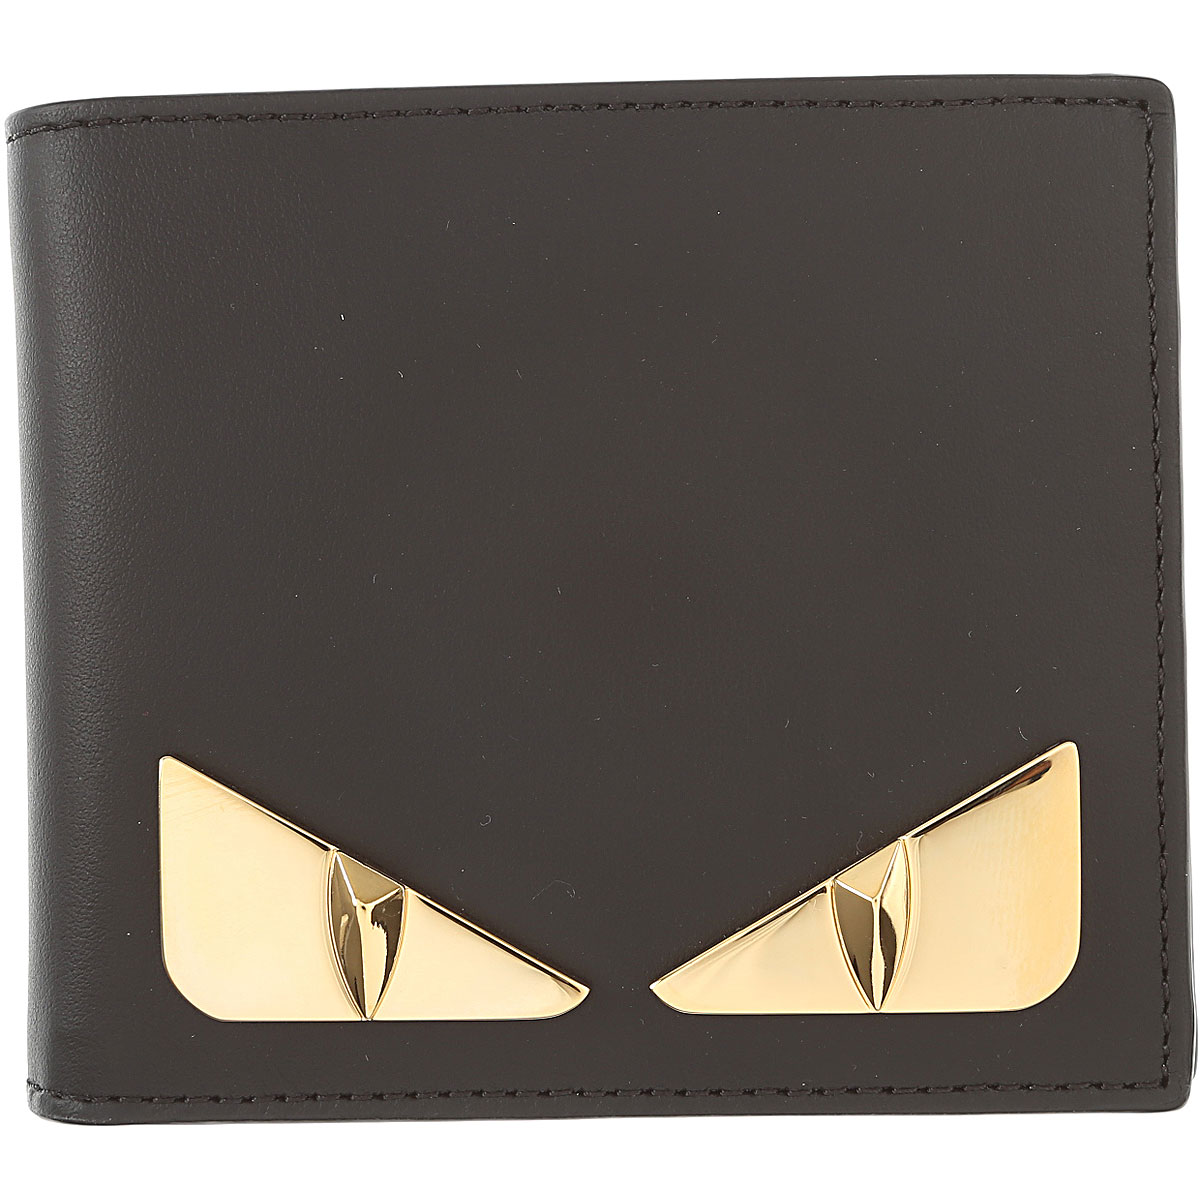 Image of Fendi Mens Wallets, Black, Leather, 2017